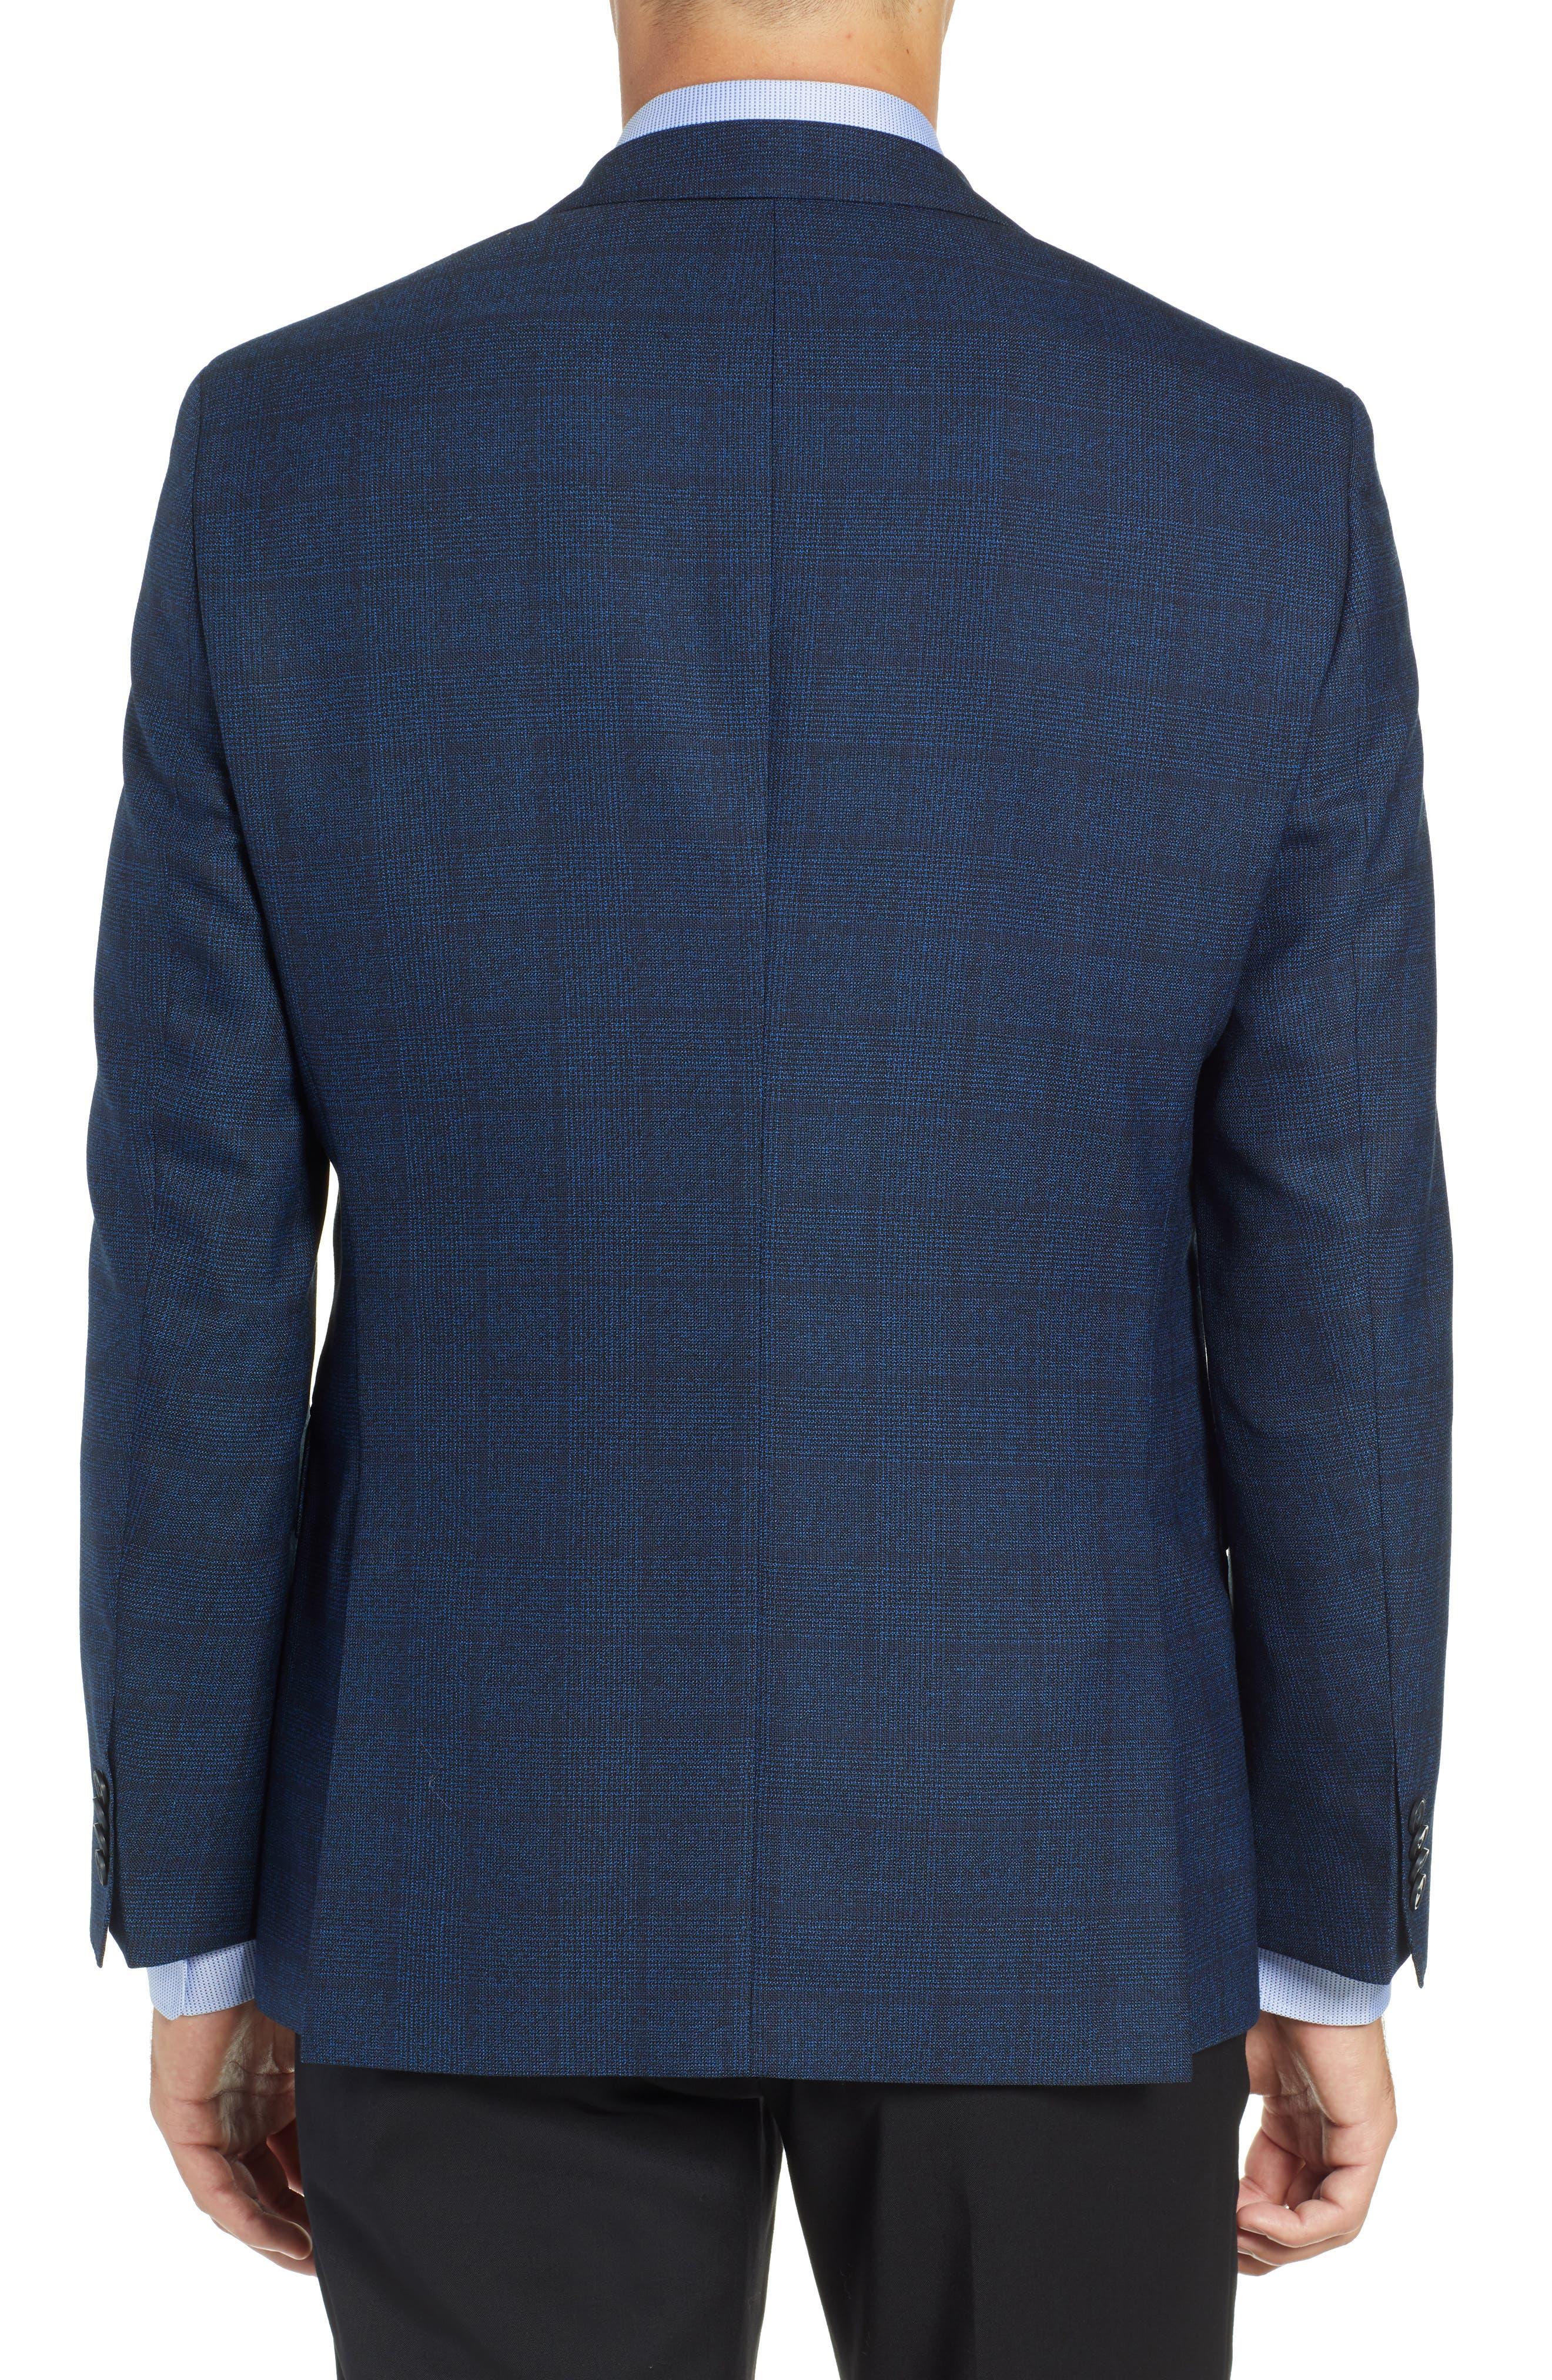 Jewels Classic Fit Plaid Wool Sport Coat,                             Alternate thumbnail 2, color,                             DARK BLUE